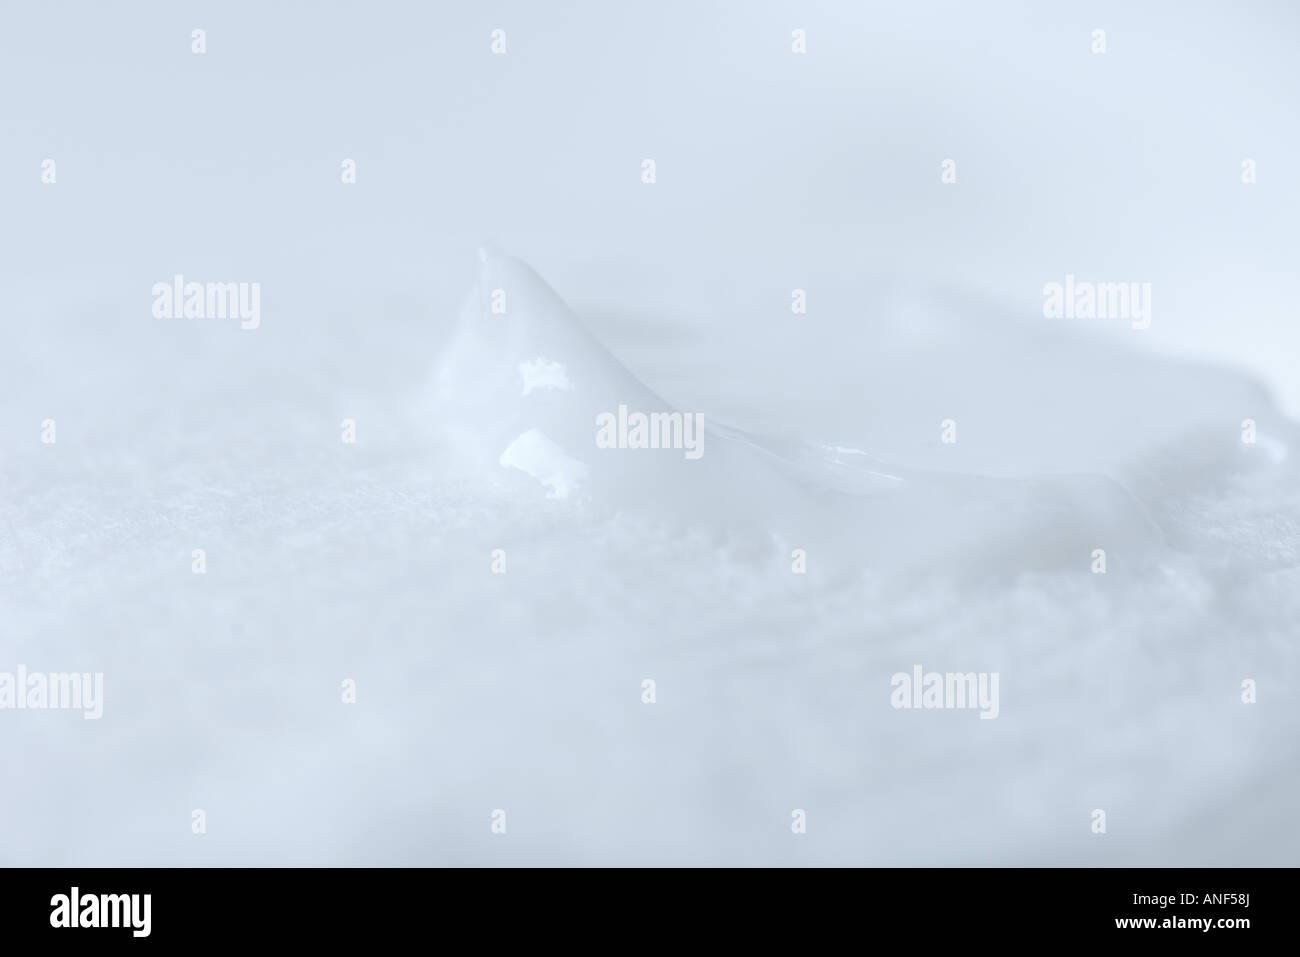 Loción en algodón, extreme close-up Imagen De Stock